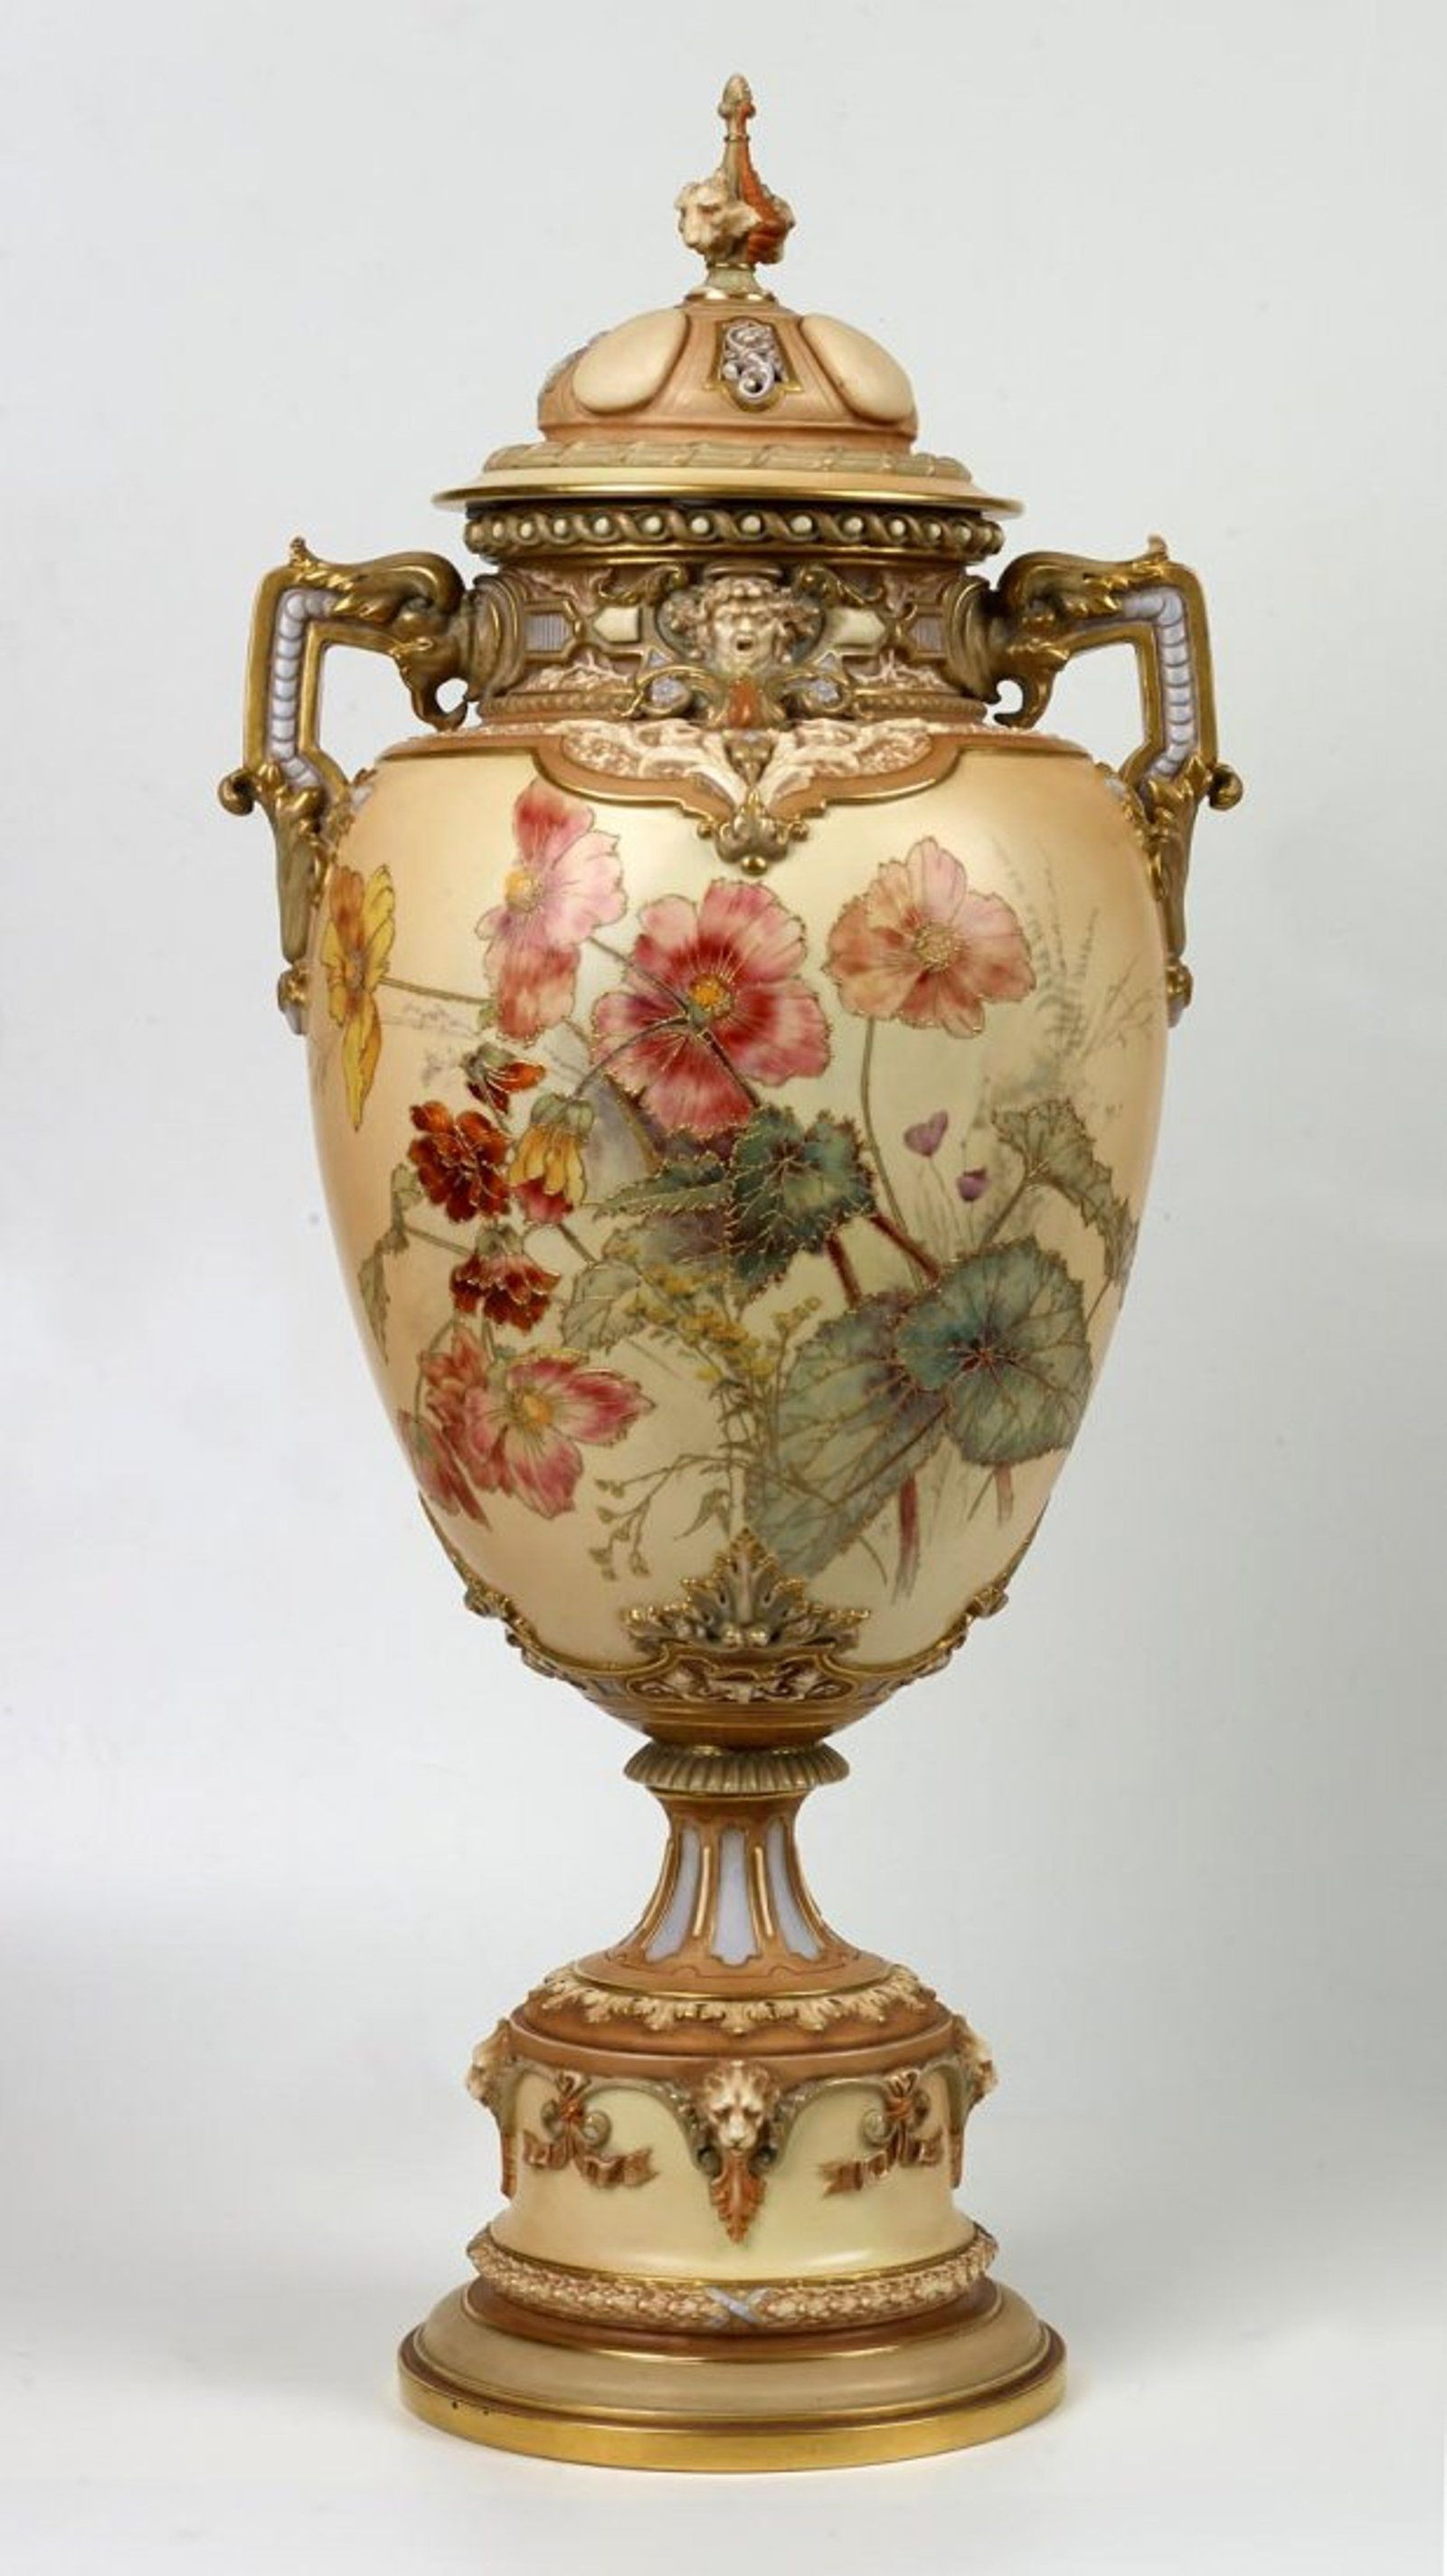 vintage japanese satsuma vase of large urn vase images antiques gifts wonderful large antique with regard to large urn vase stock a large royal worcester covered urn english circa 1894 of large urn